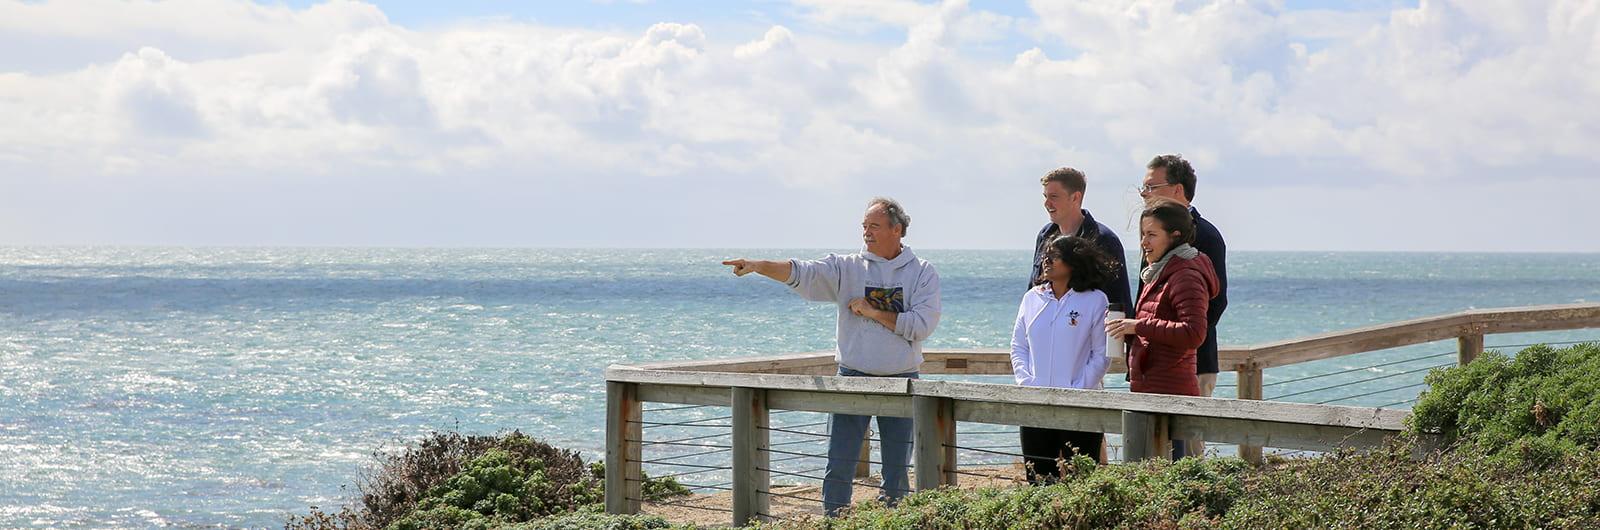 Future Leaders in Coastal Science Award